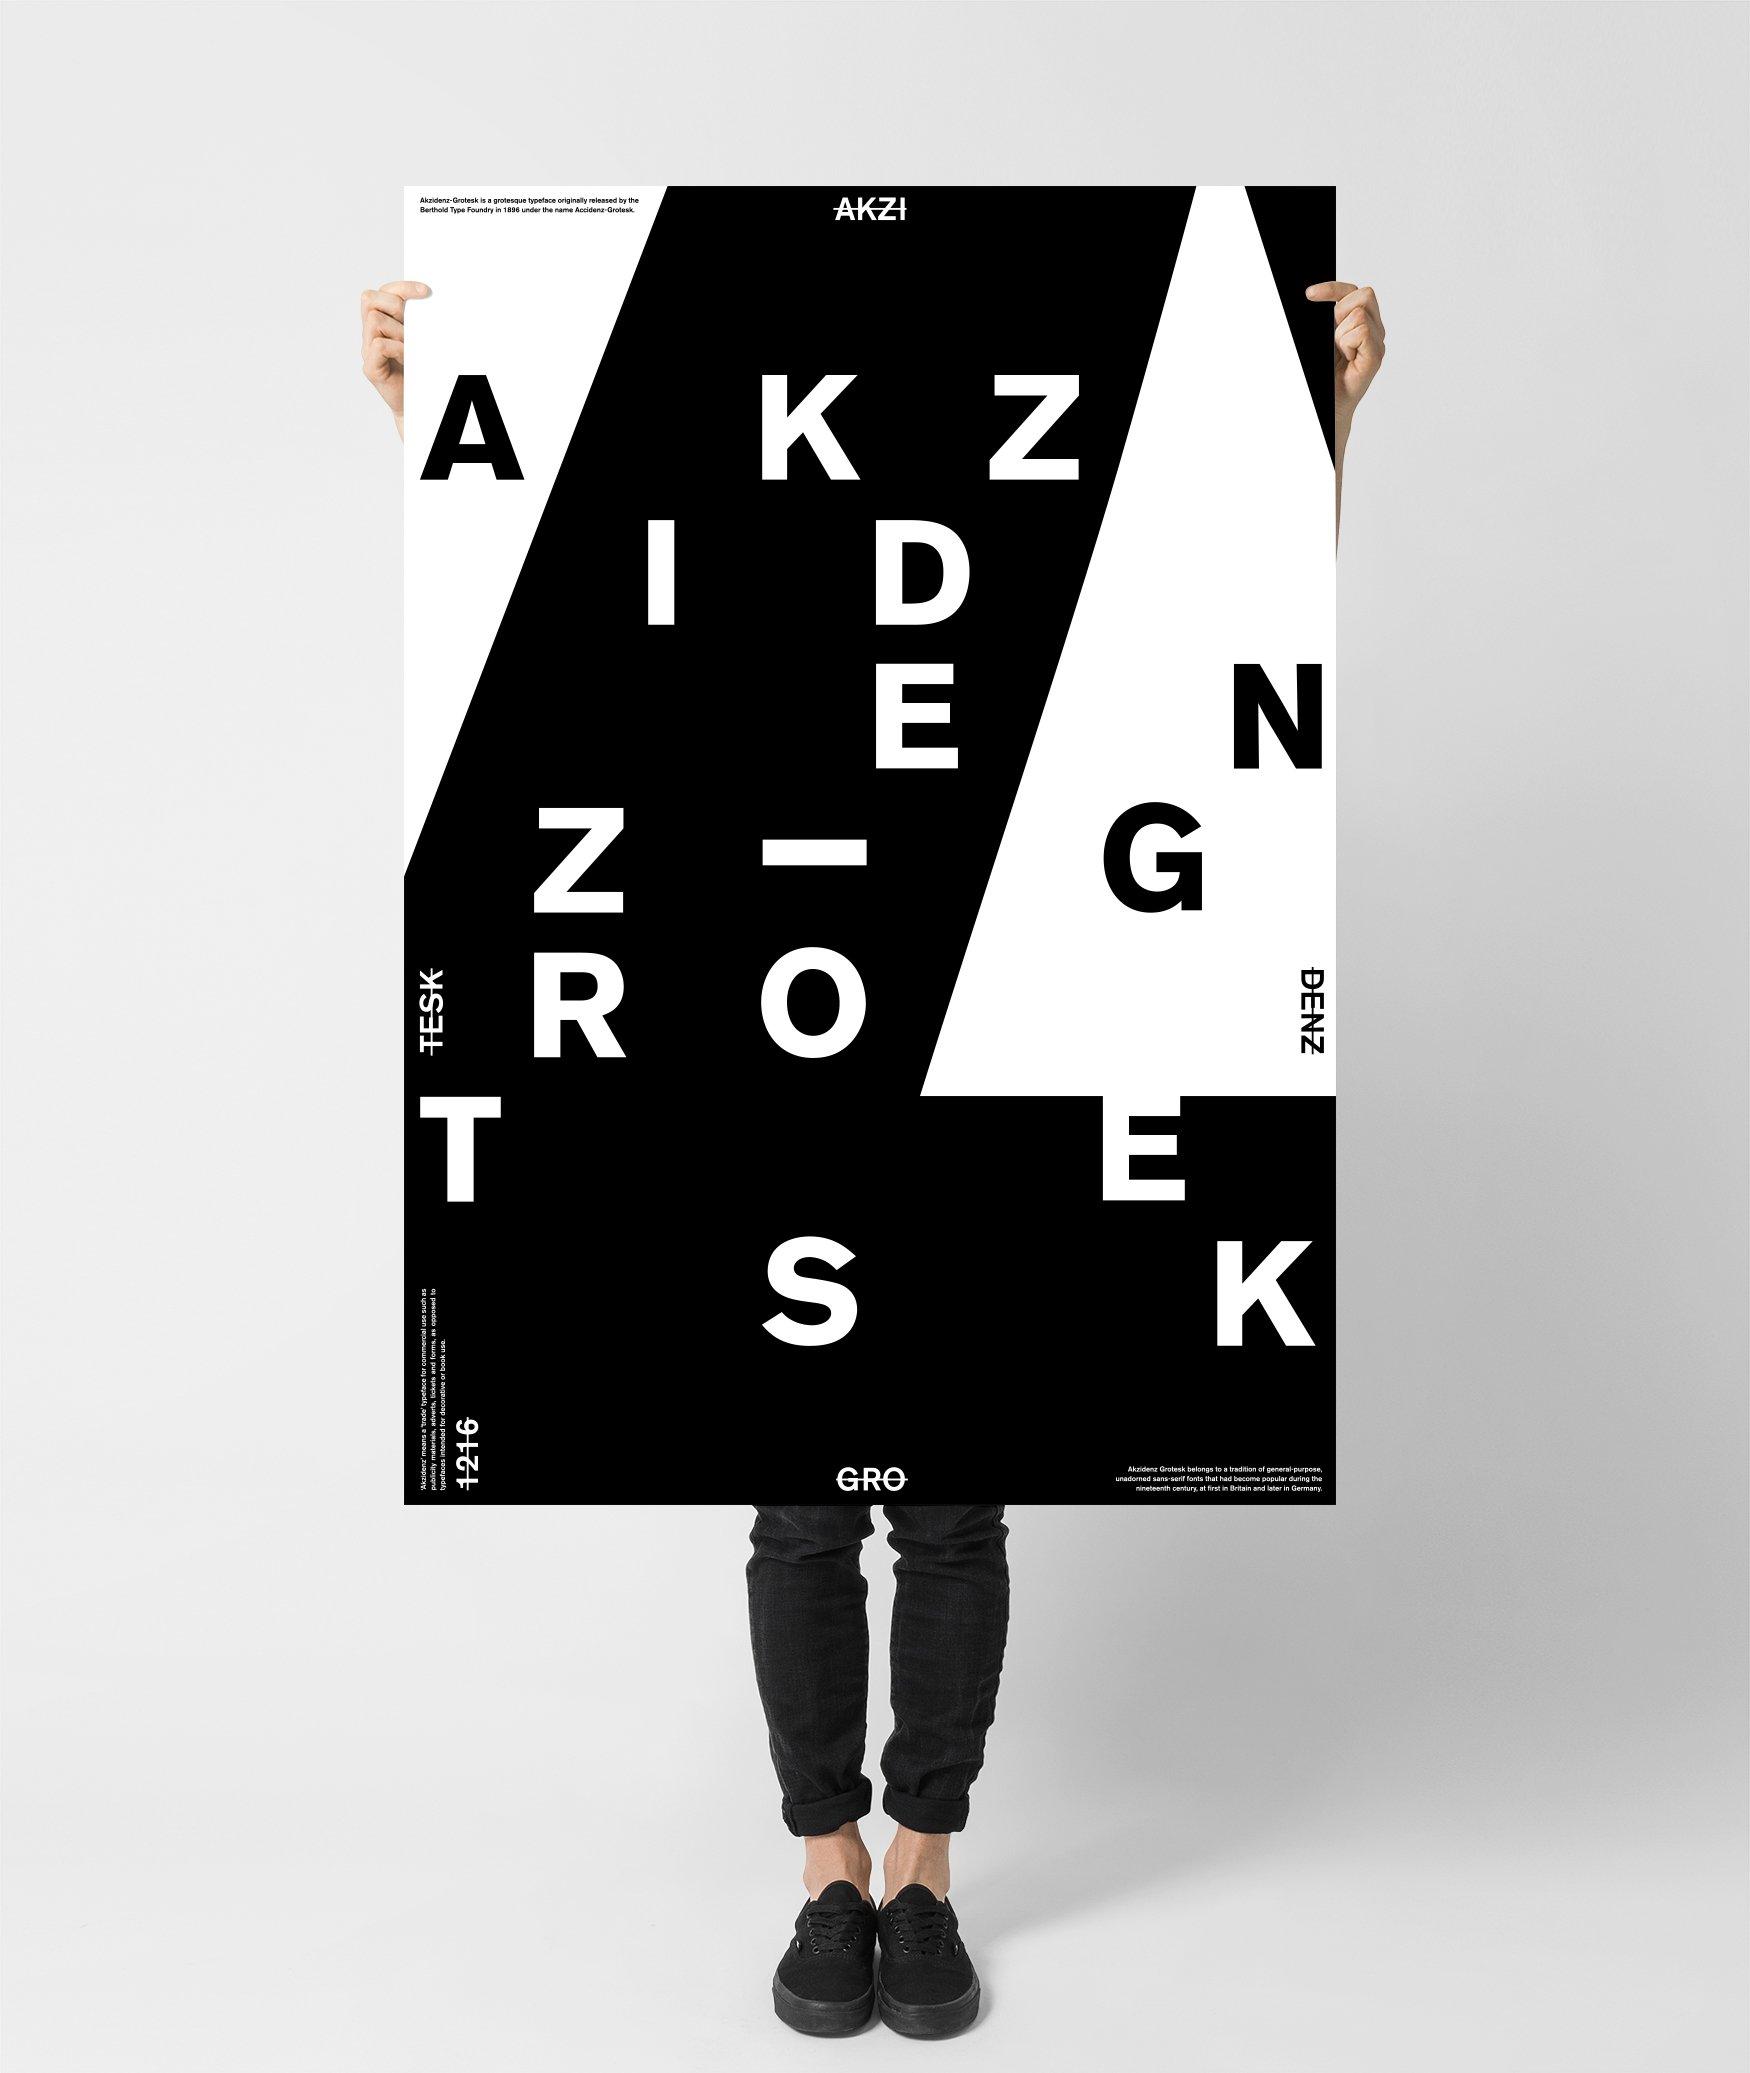 Image of ● AkzGrotesk